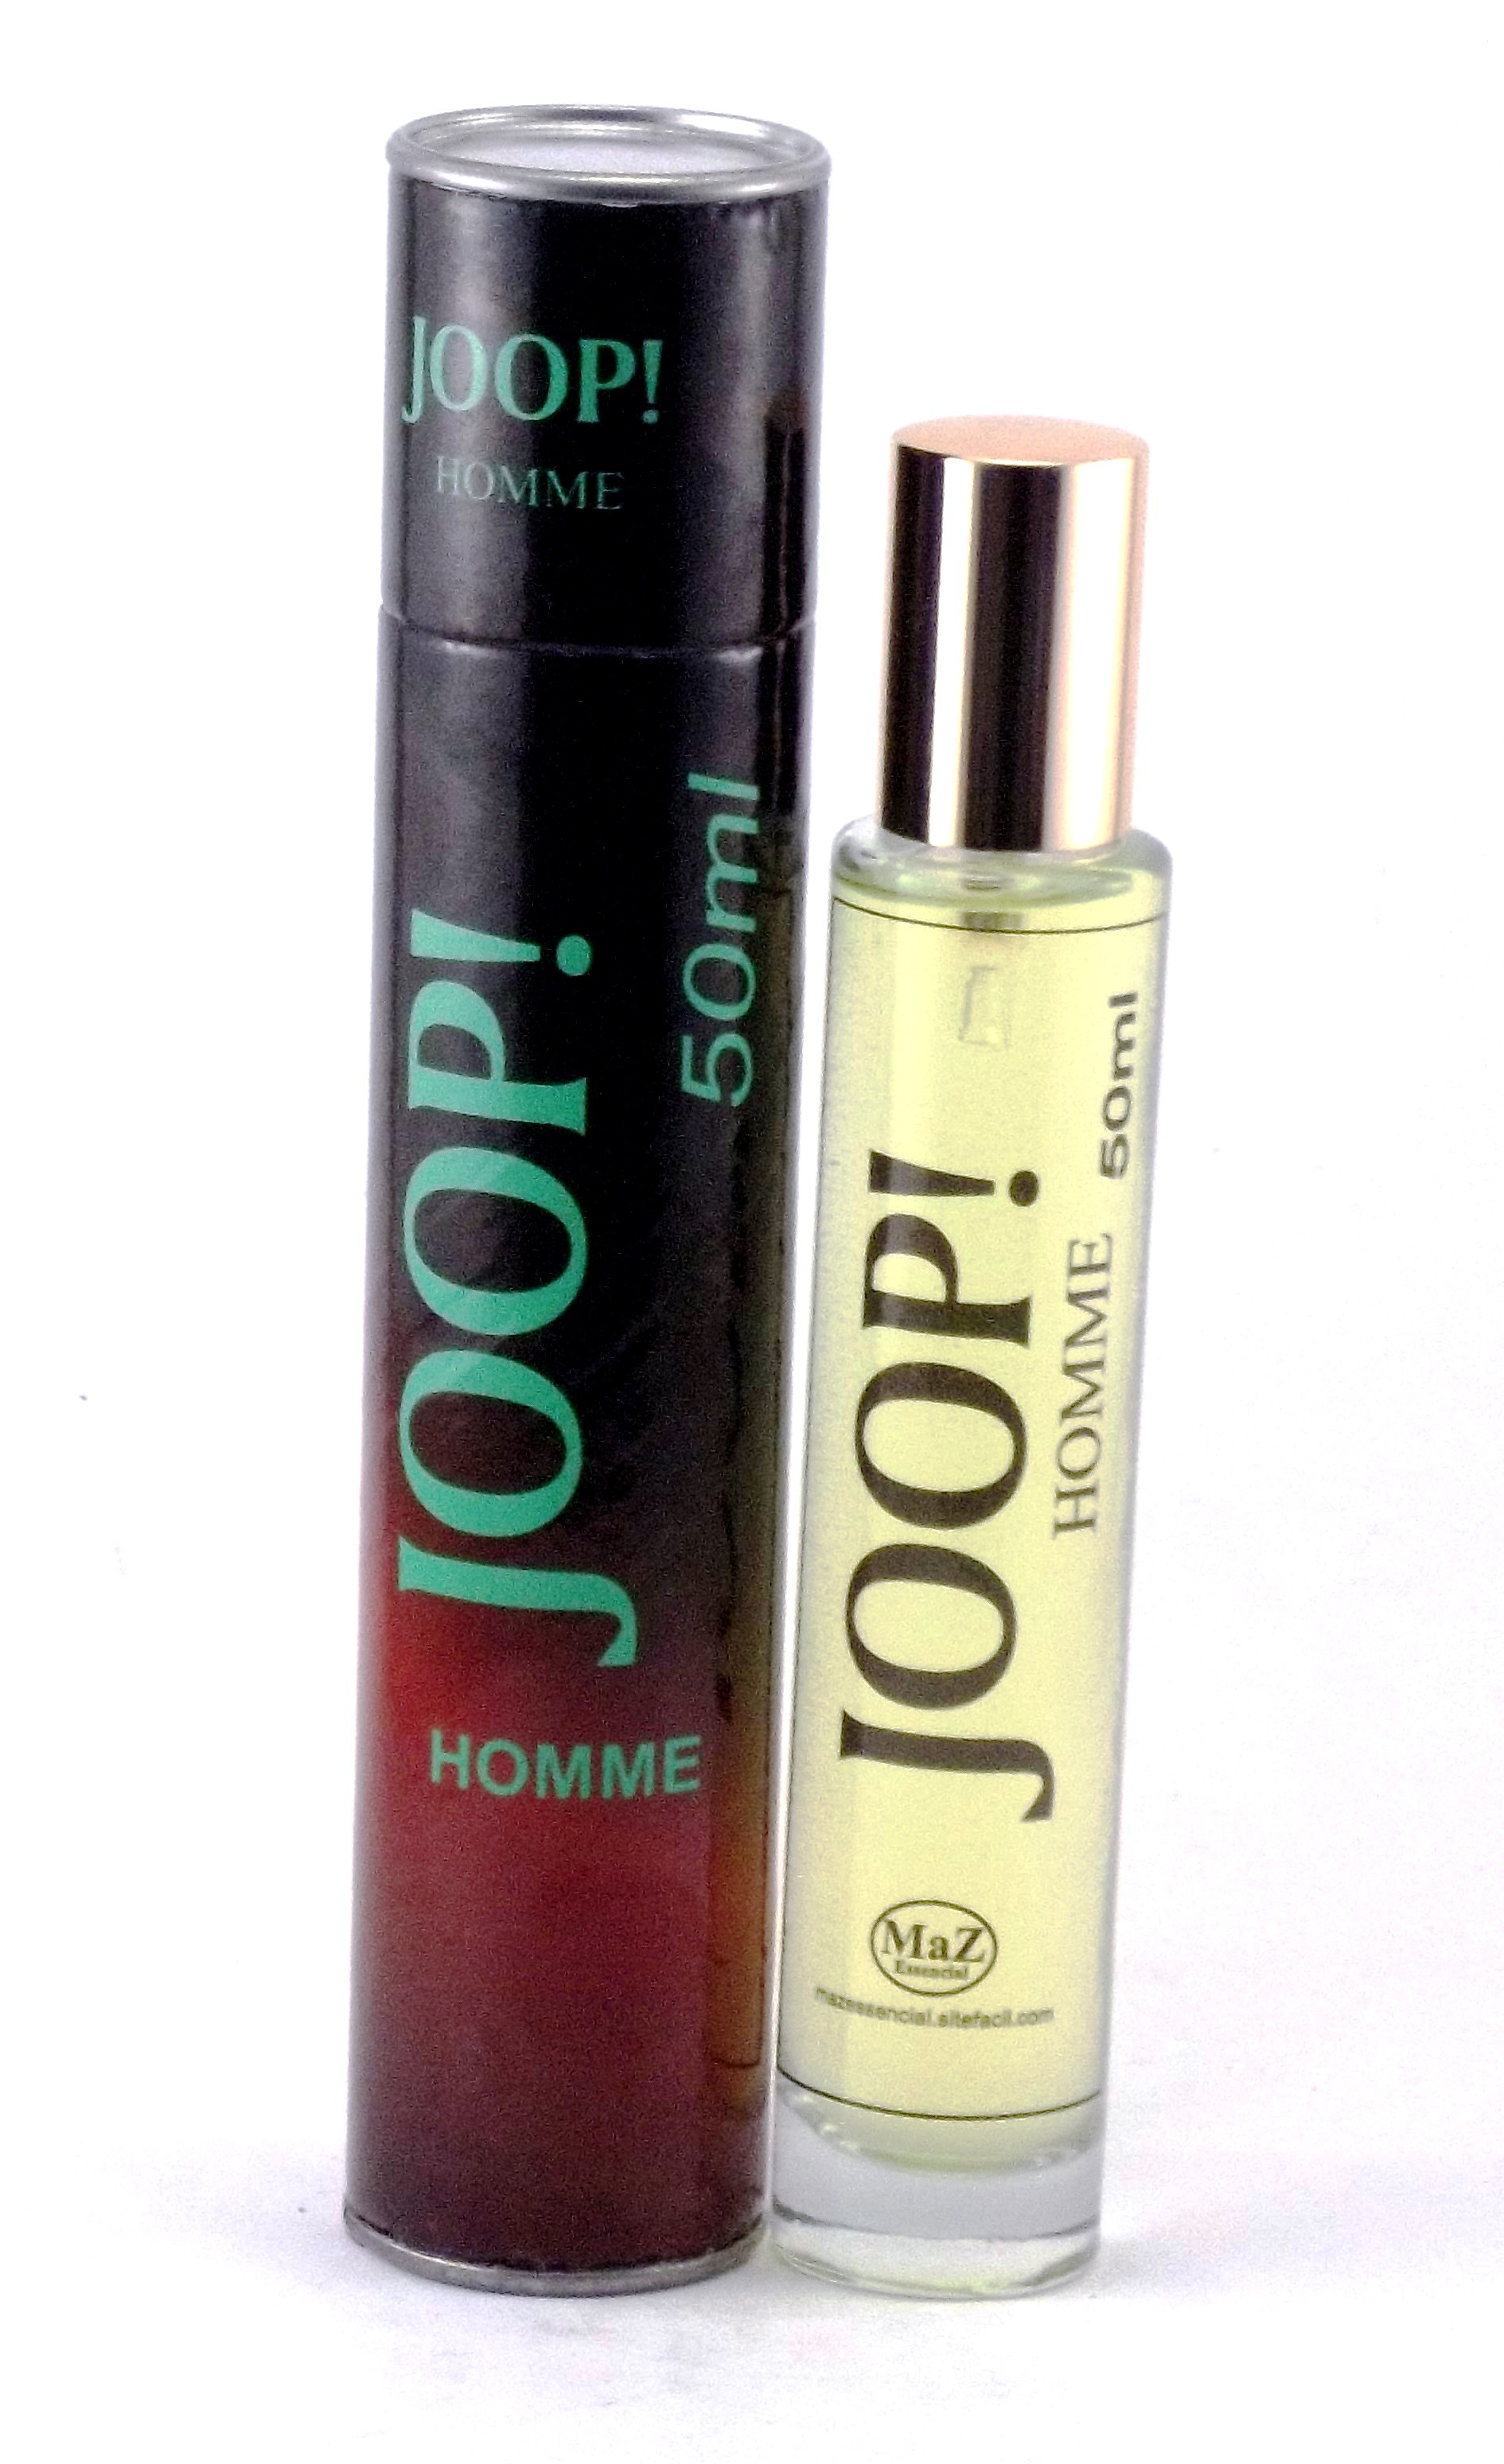 b440b46c94ac9 Perfume Inspirado Joop Homme Masculino Contratipo 100ml   Elo7